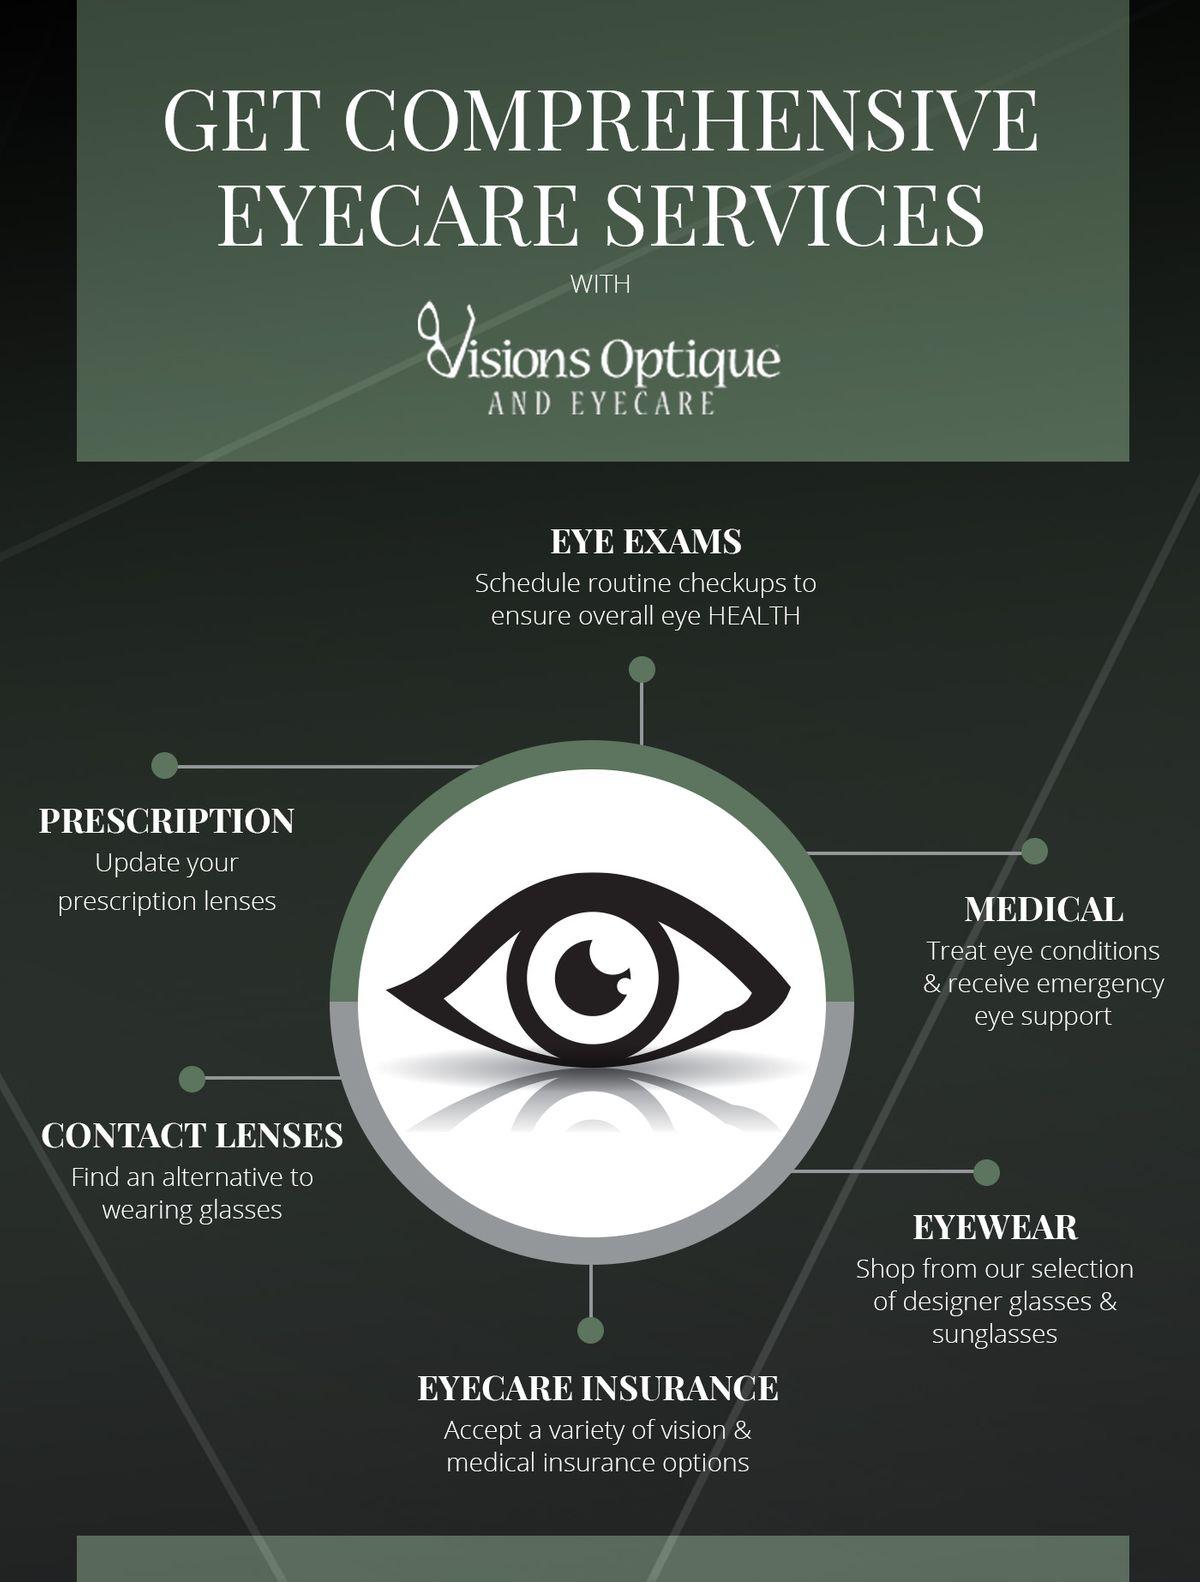 Get Comprehensive Eyecare Services